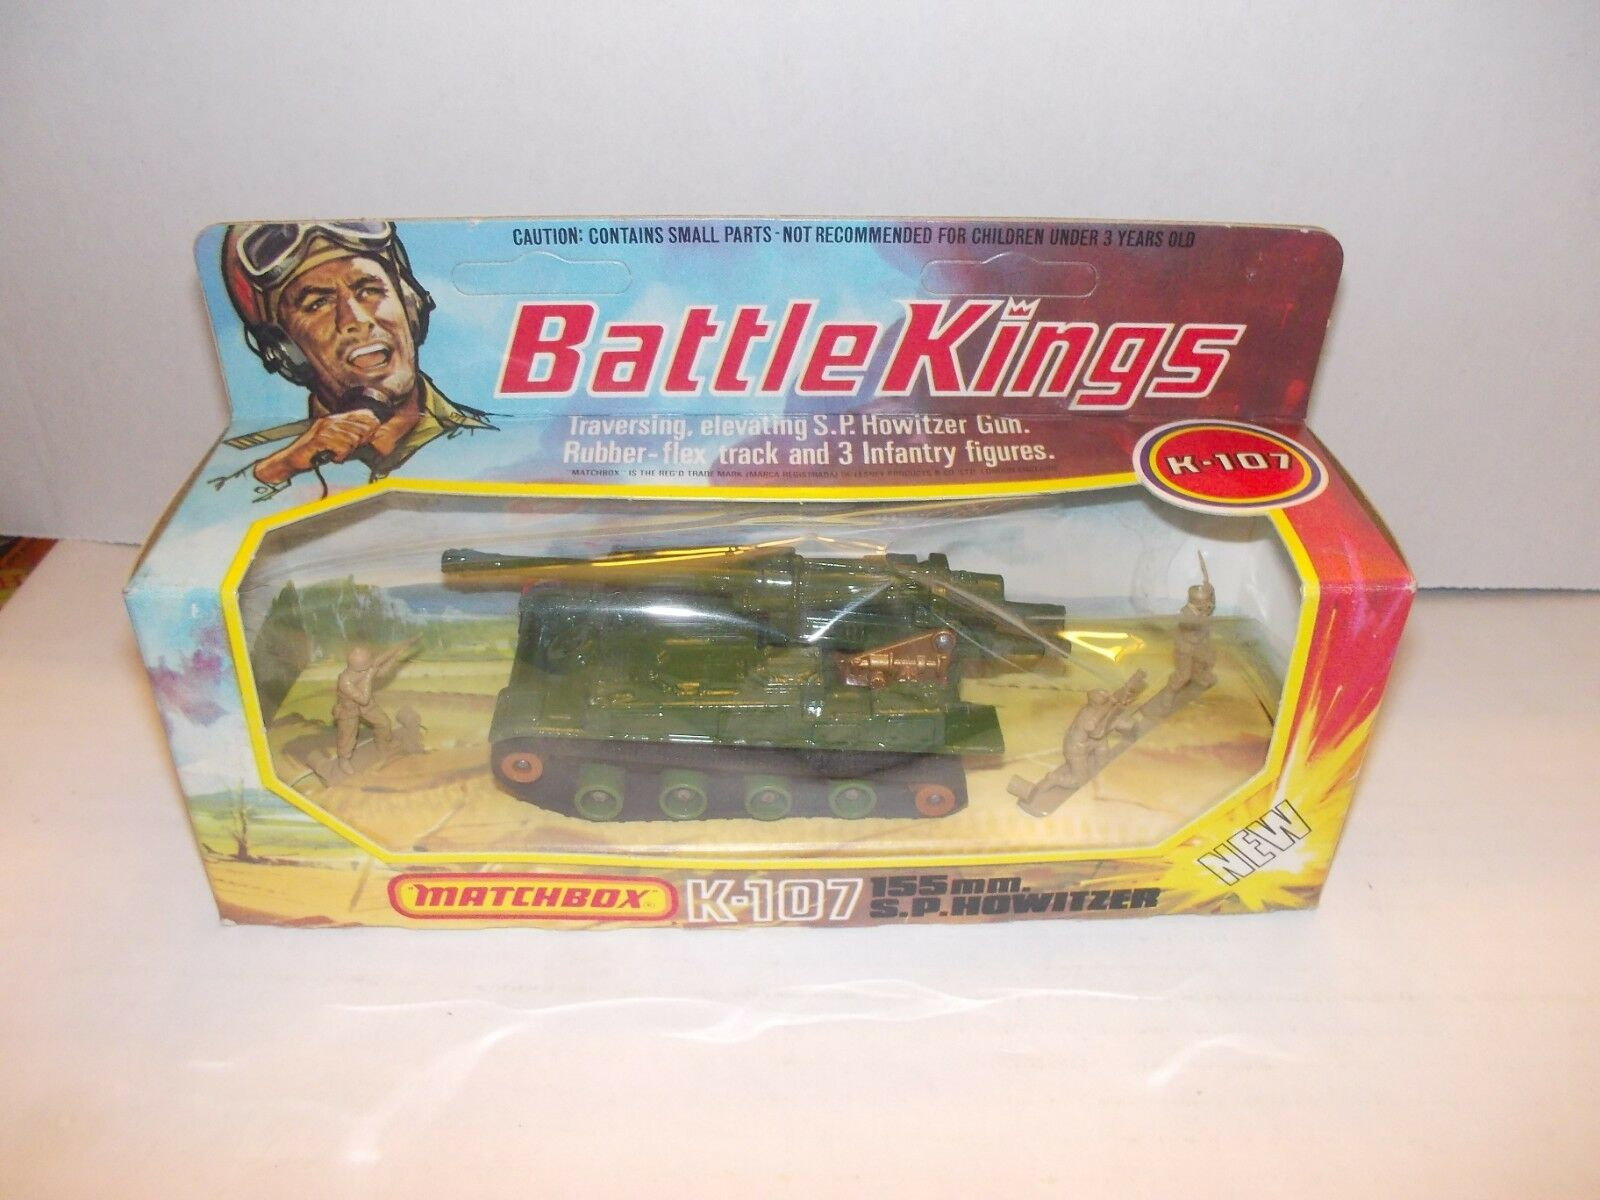 Vintage Matchbox King Taille Battle Kings TANK NEW IN BOX K107 K-107 avec pistolet Guy droit Box